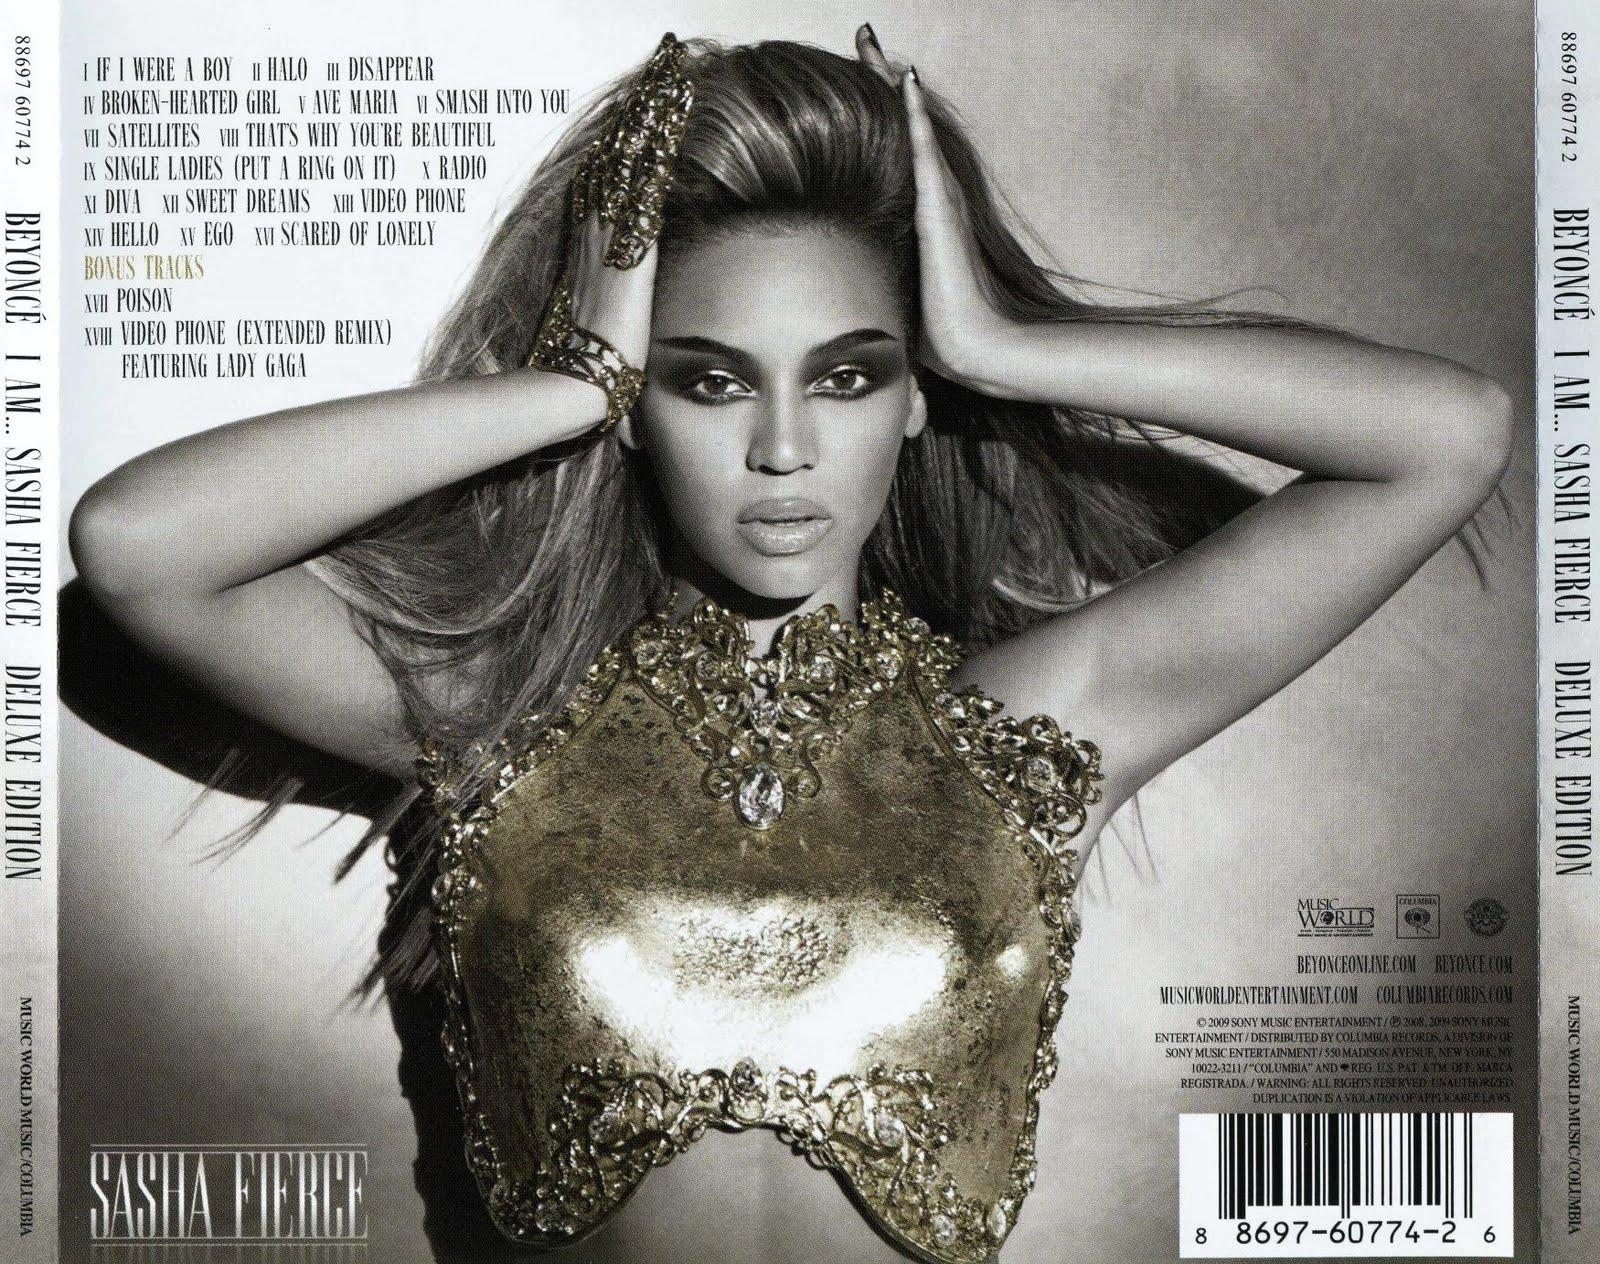 beyonce i am sasha fierce deluxe edition album cover